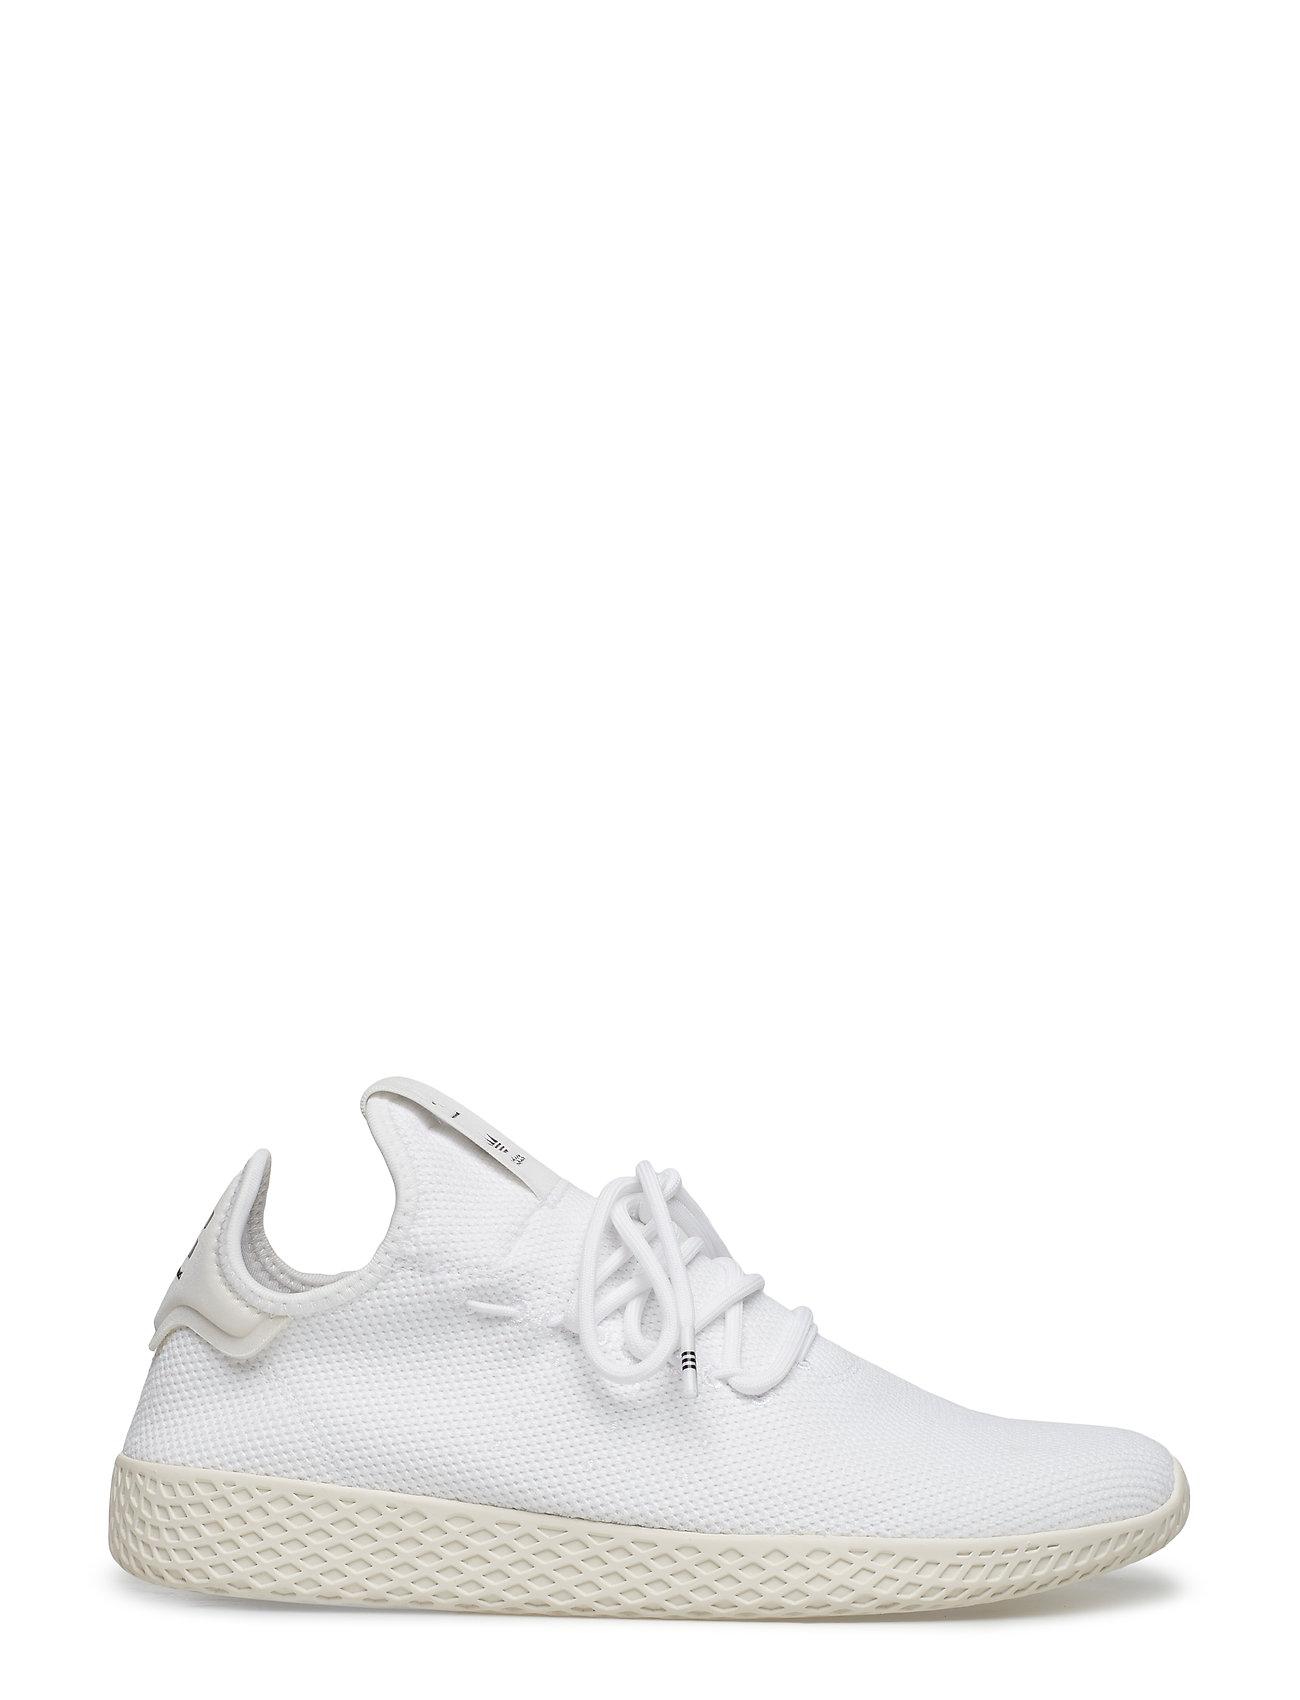 adidas Originals PW TENNIS HU Sneakers Herrer Sko low